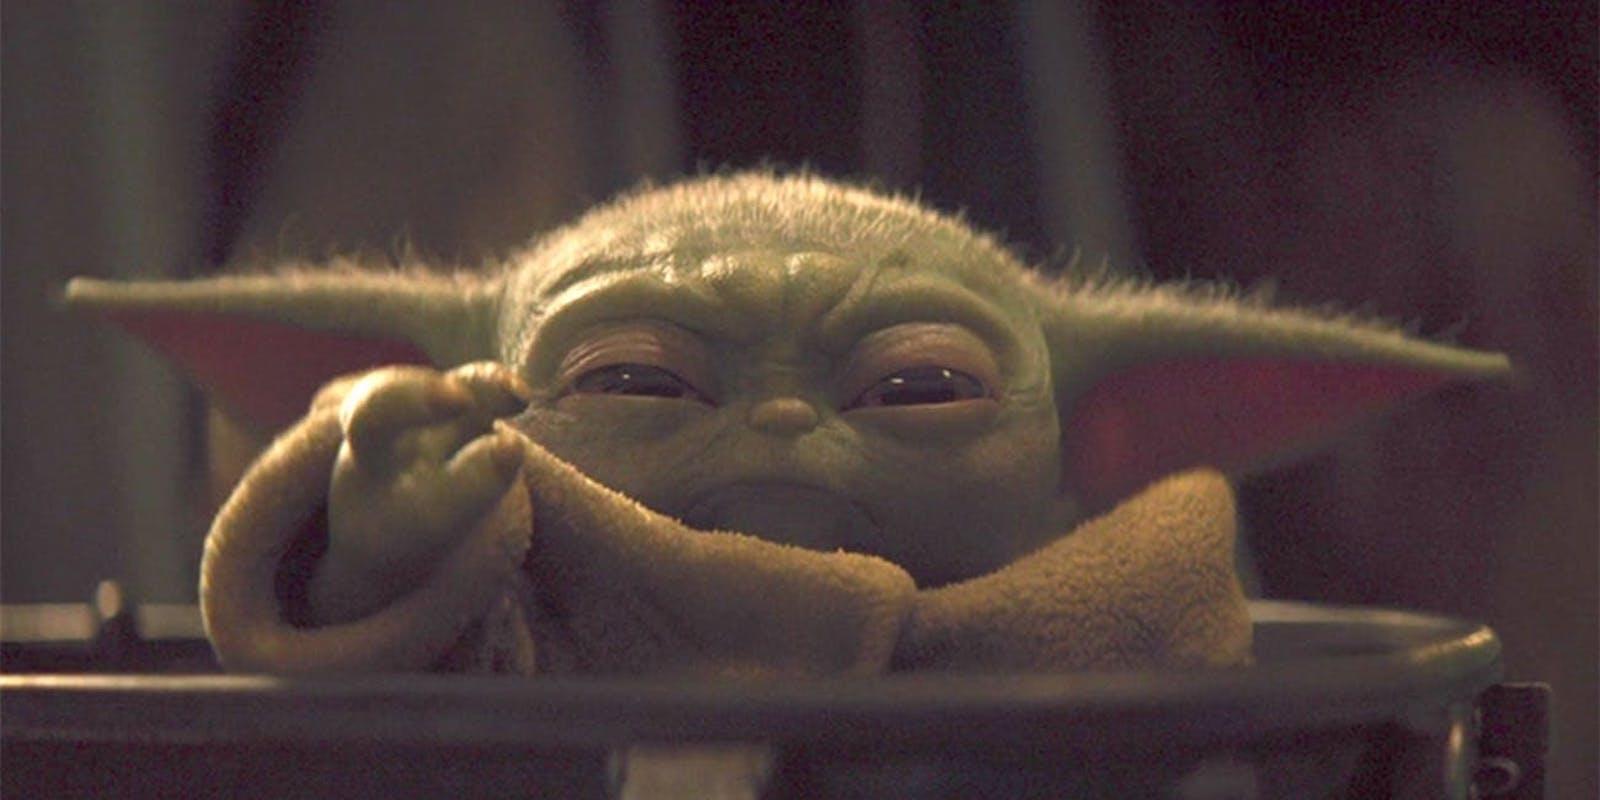 Is Baby Yoda The Yoda Baby Yoda Timeline Explained Finalboss